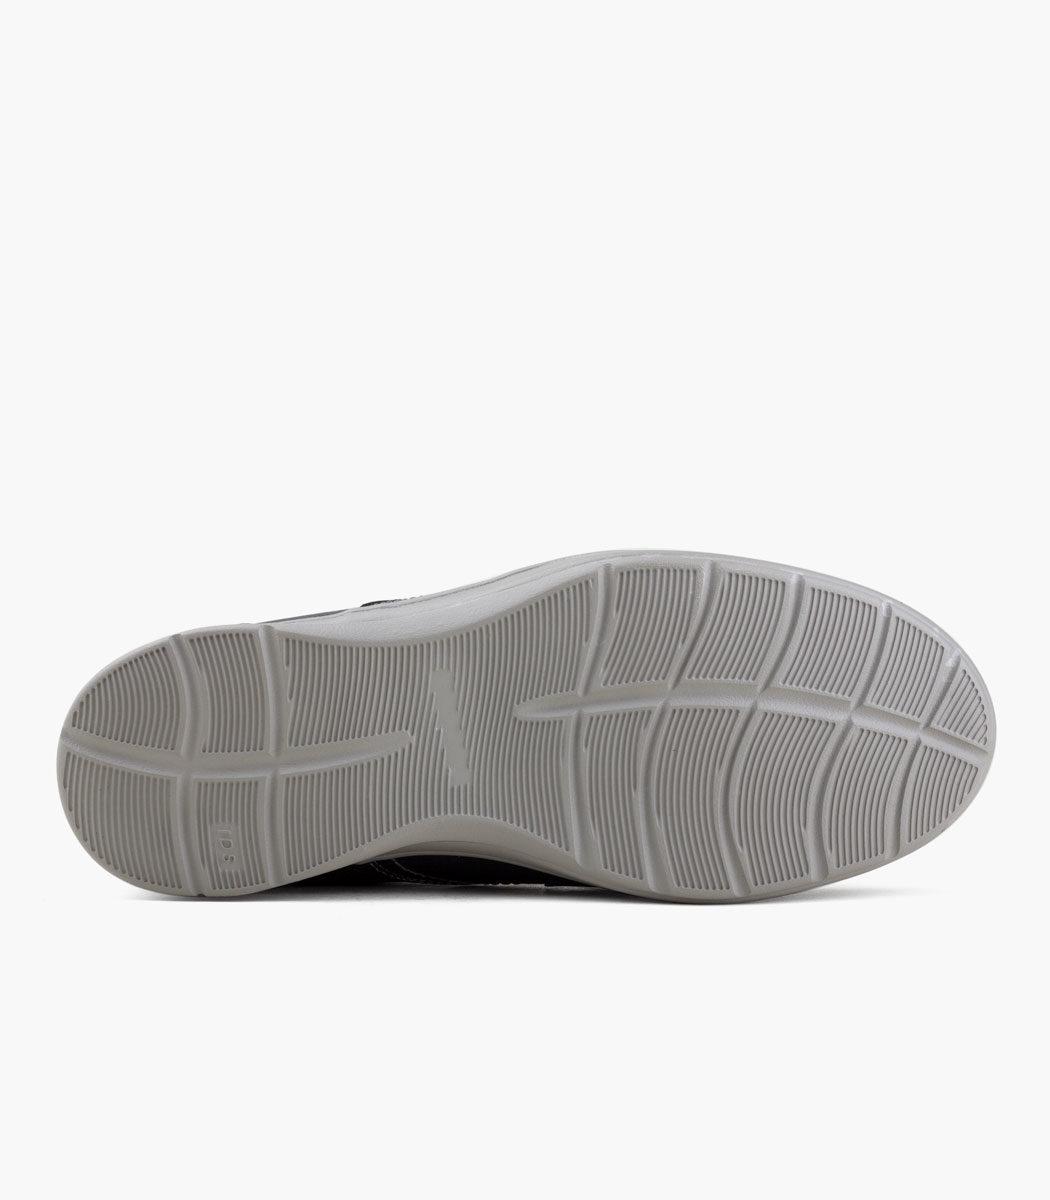 Zapato casual Hombre BOATING Cushion